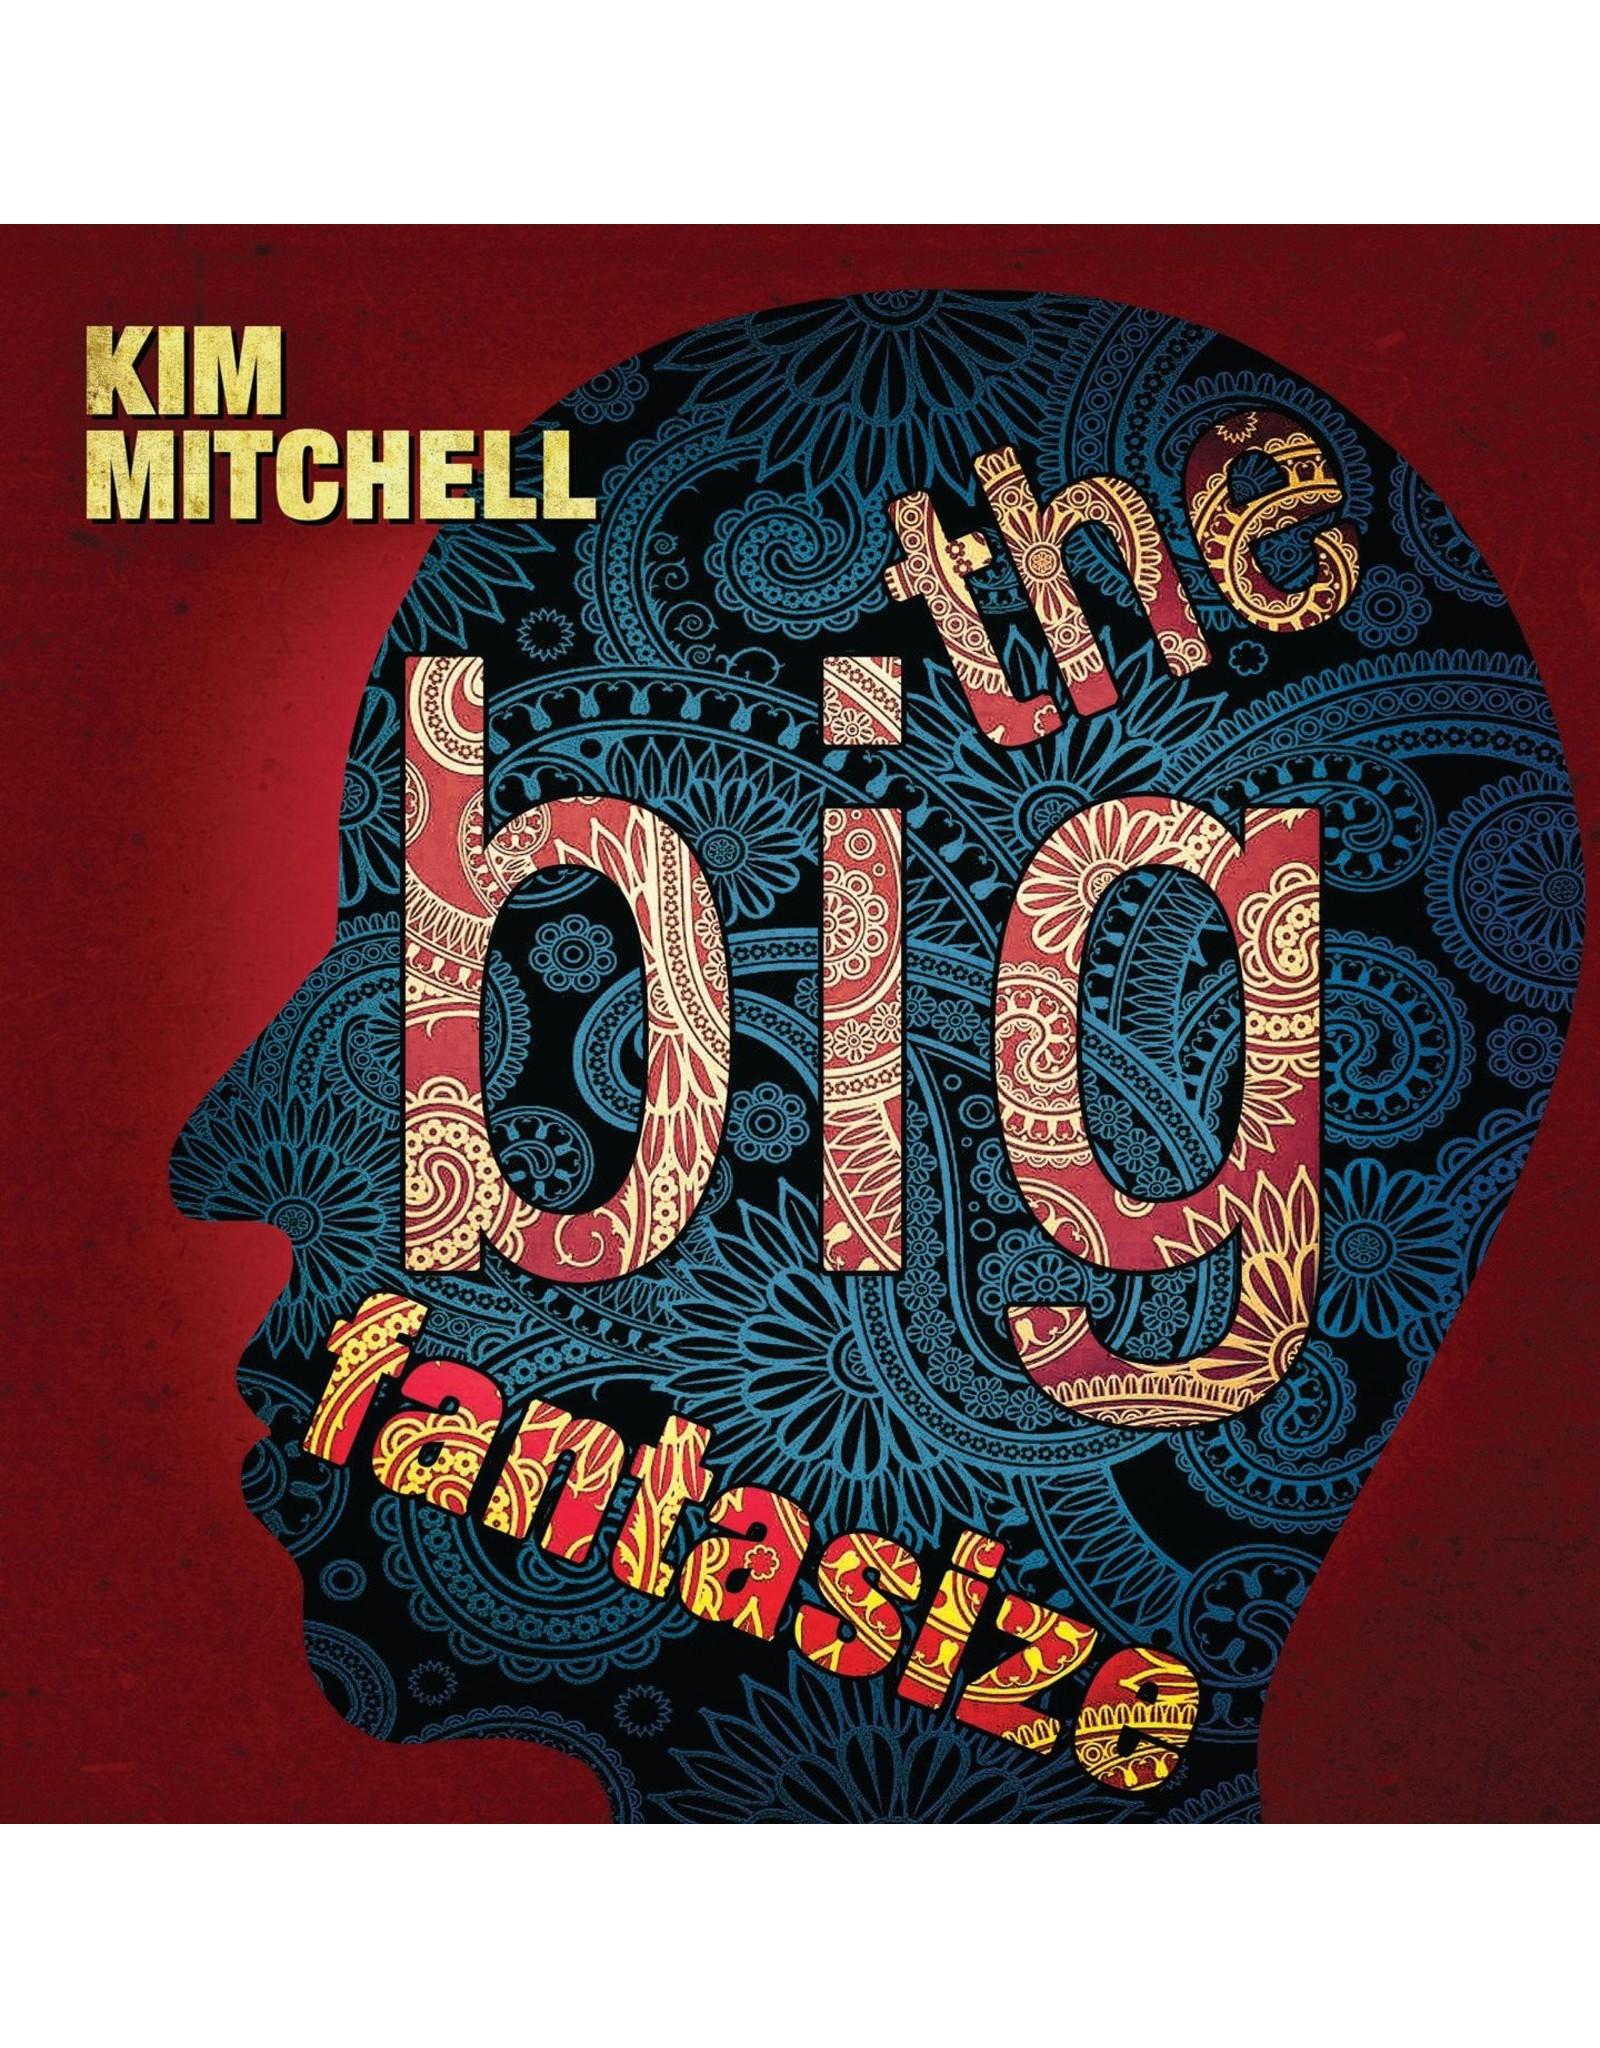 Kim Mitchell - The Big Fantasize